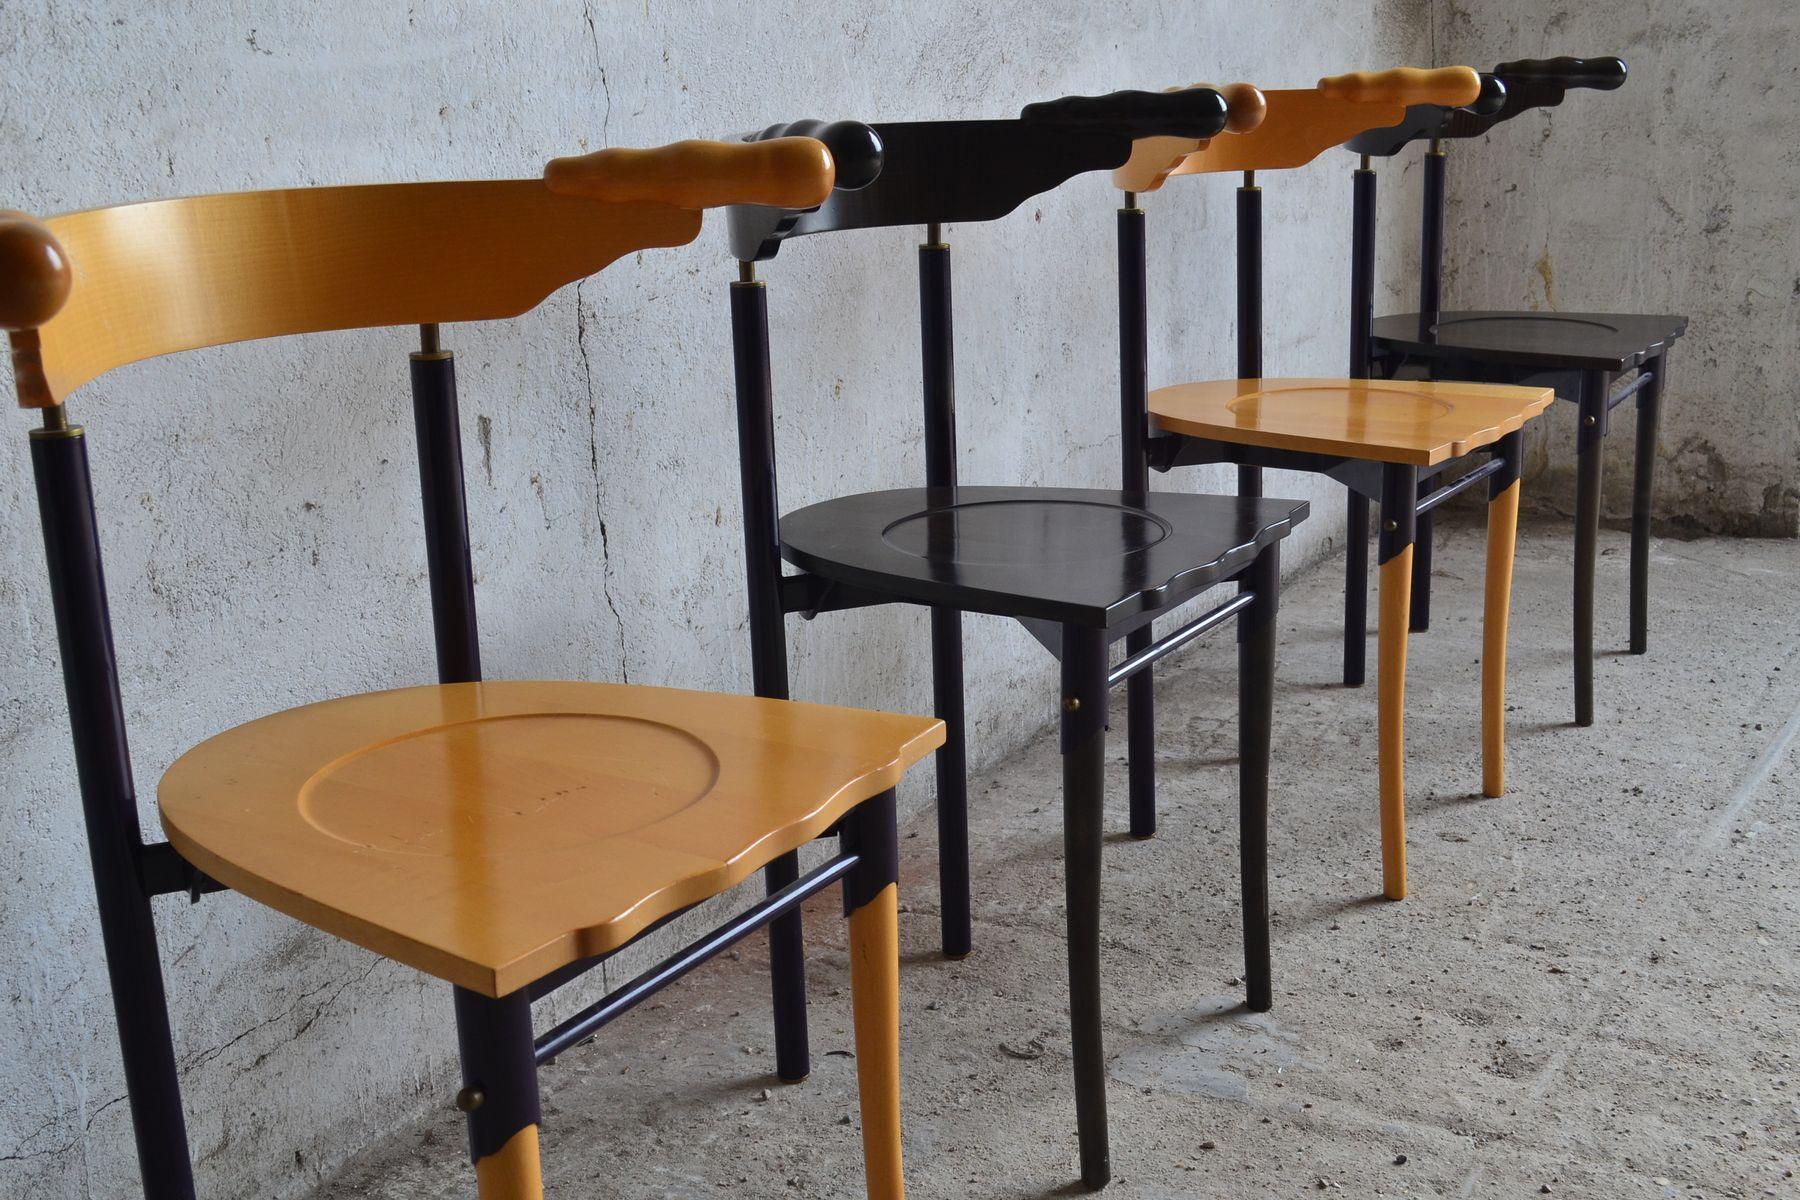 Set de salle manger post moderne par borek sipek pour for Set de salle a manger